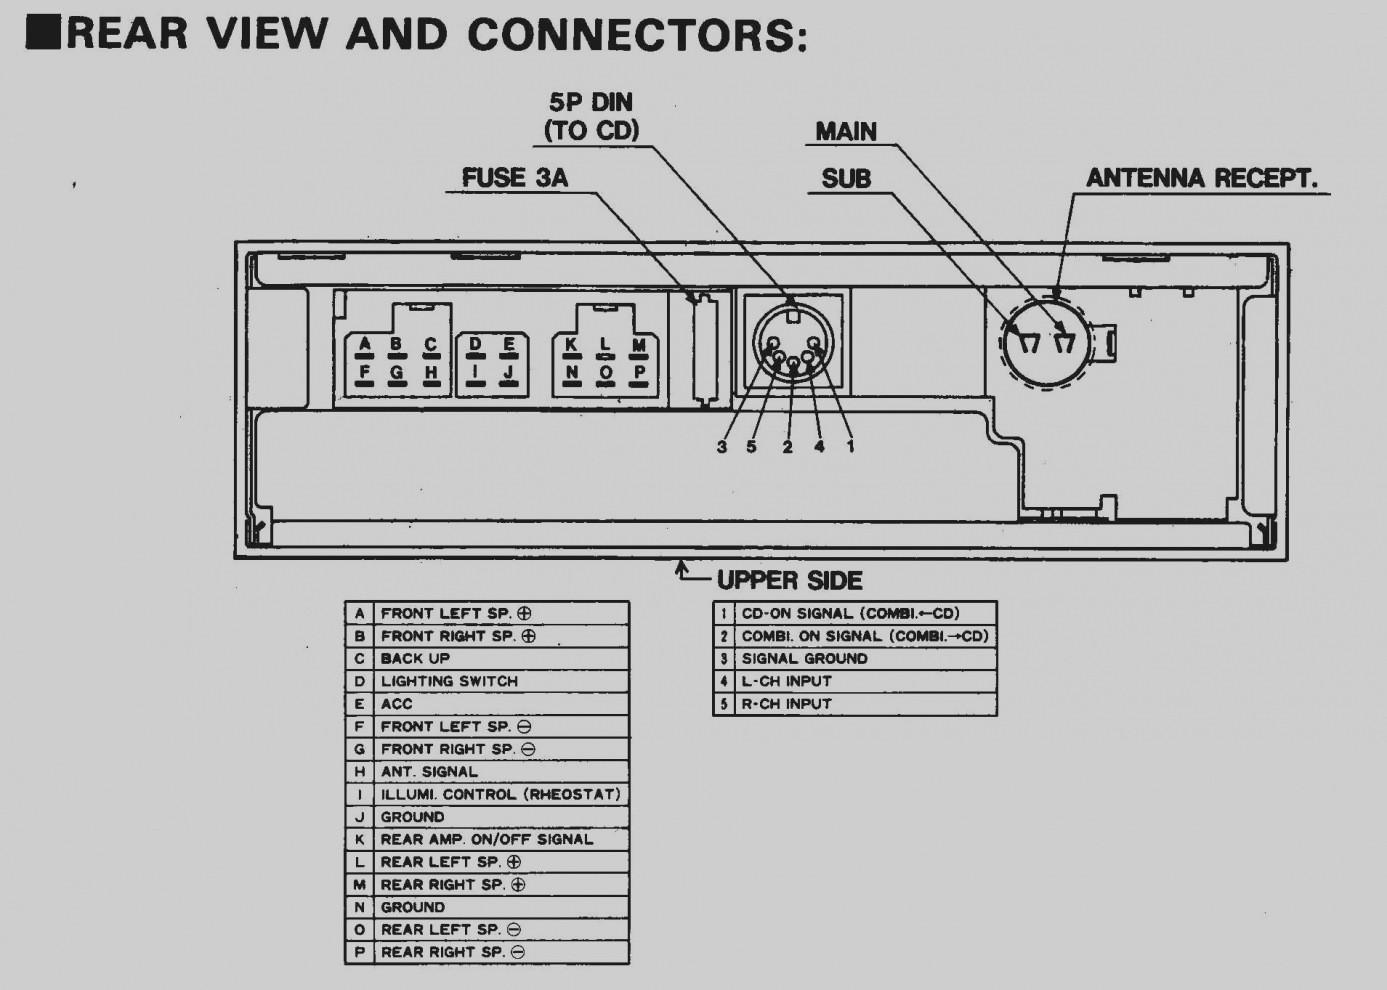 cd dvd kenwood wiring diagram reinvent your wiring diagram u2022 rh kismetcars co uk